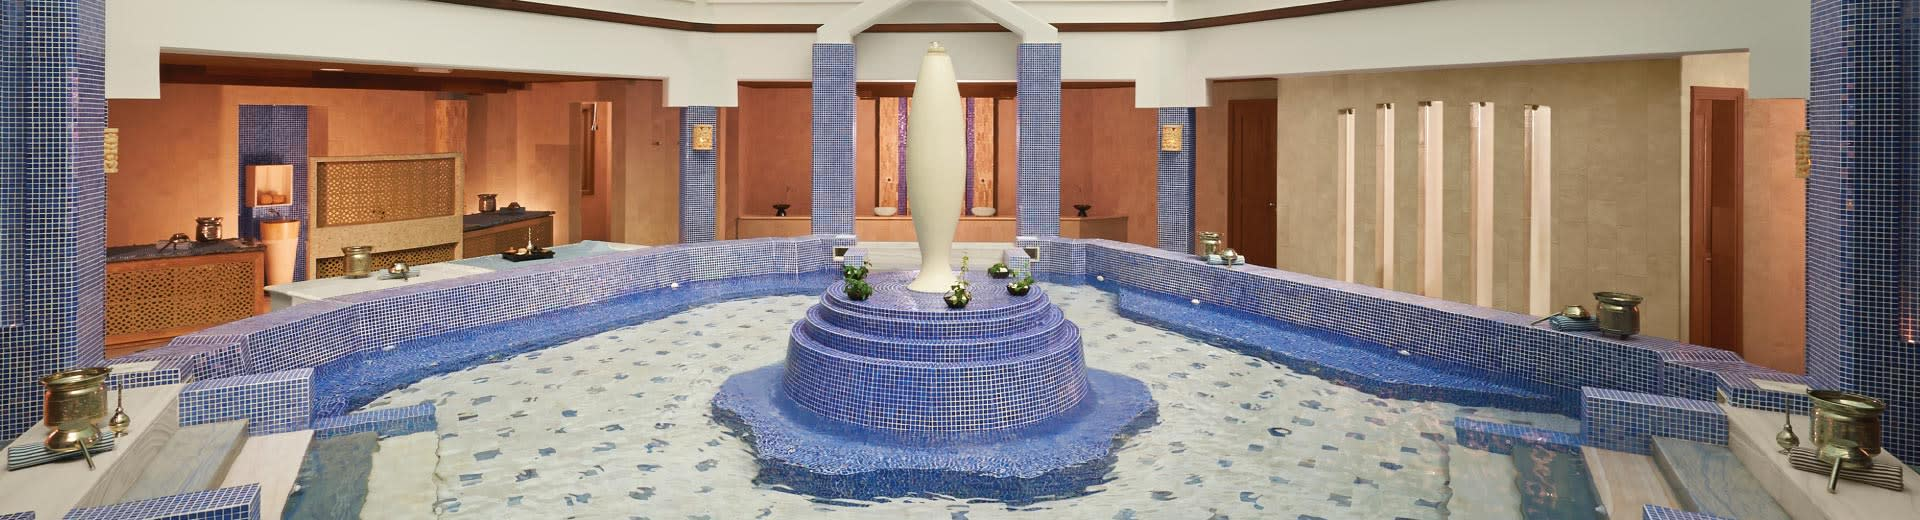 Banana Island Resort Doha Hammam Area